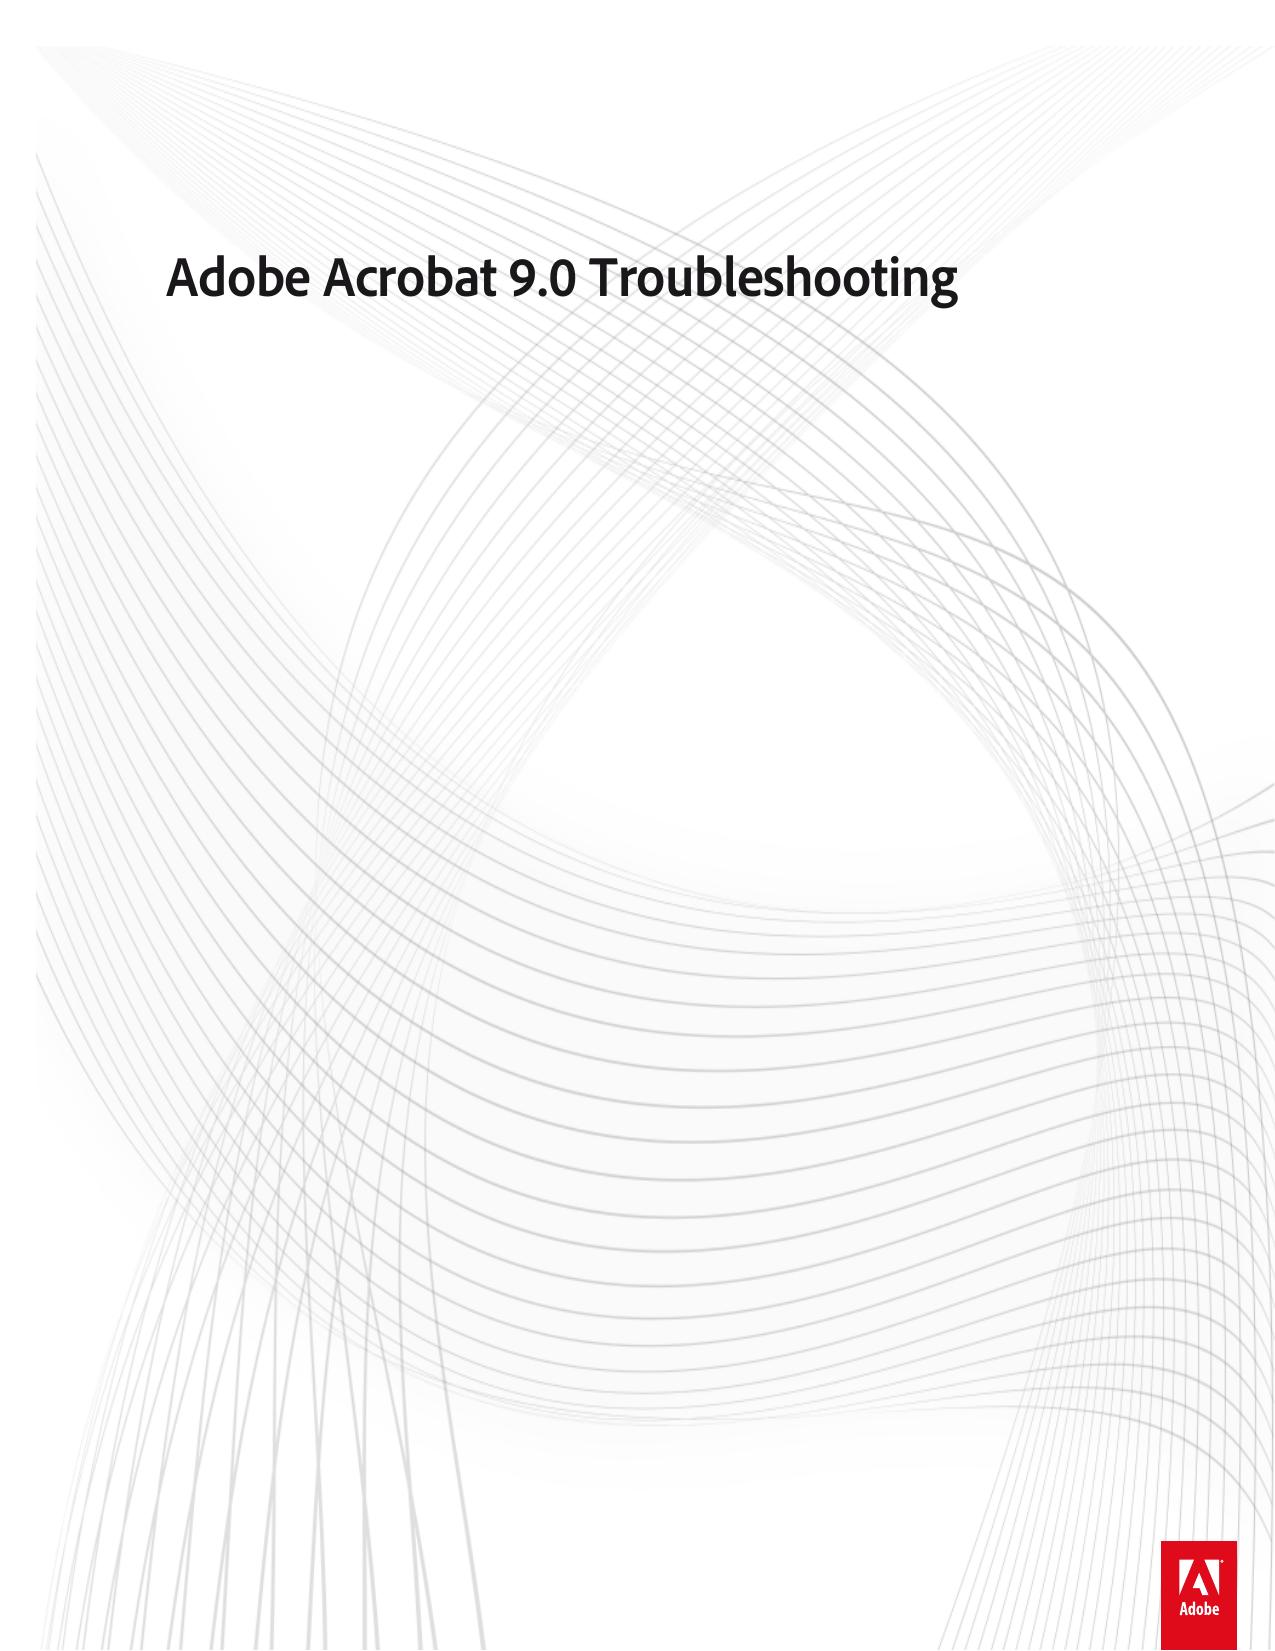 Adobe Acrobat 9 0 Troubleshooting   manualzz com